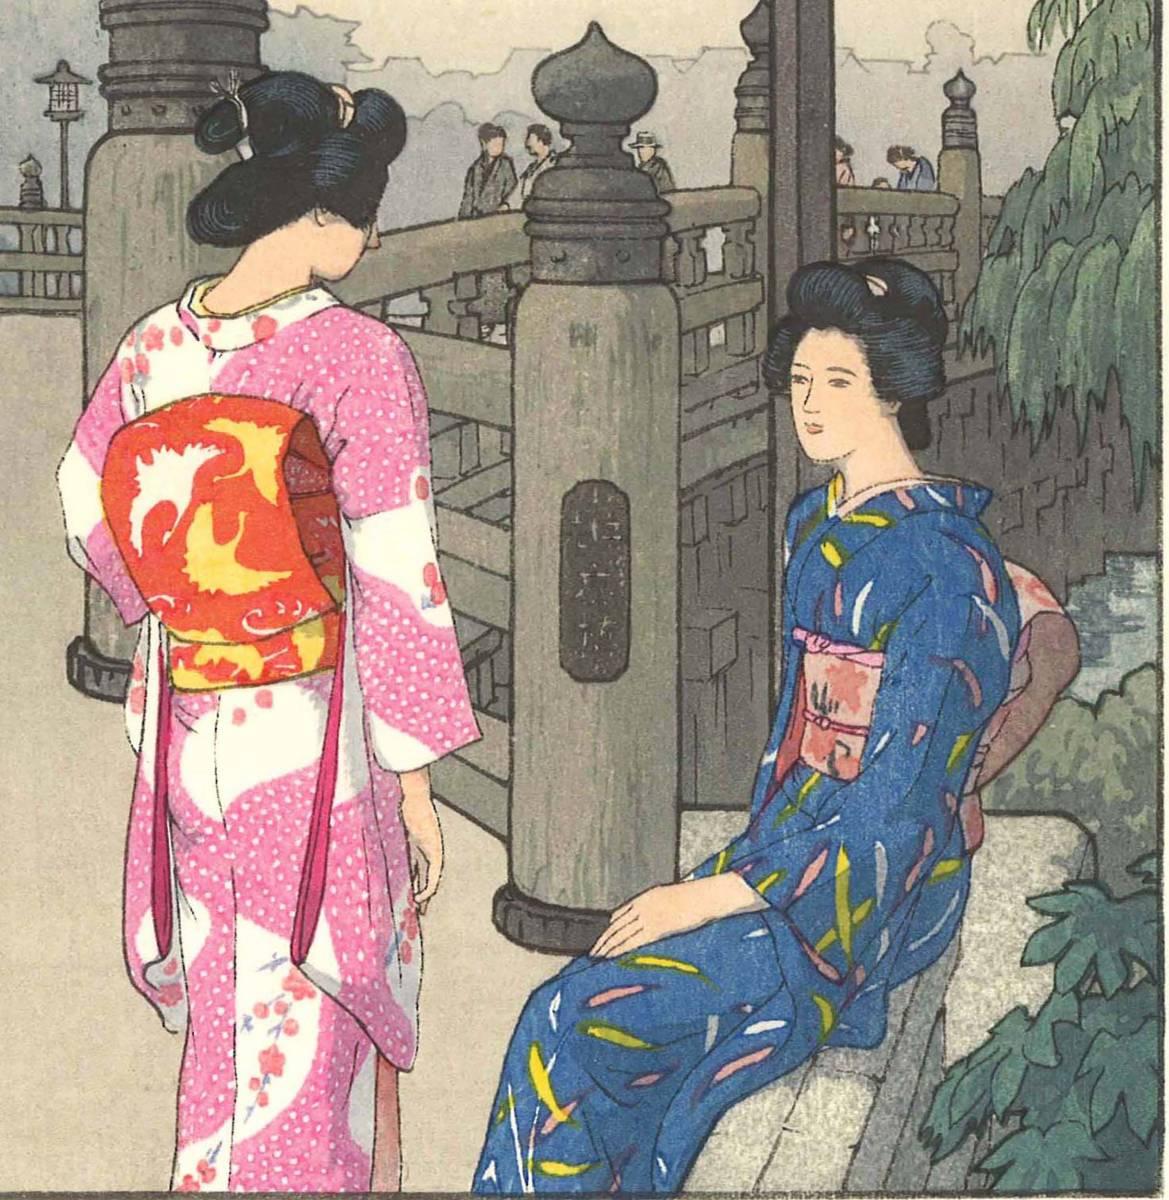 吉田遠志 木版画  014103 弁慶橋 (Benkei Bridge)  初摺1941年    最高峰の摺師の技をご堪能下さい!!_画像10